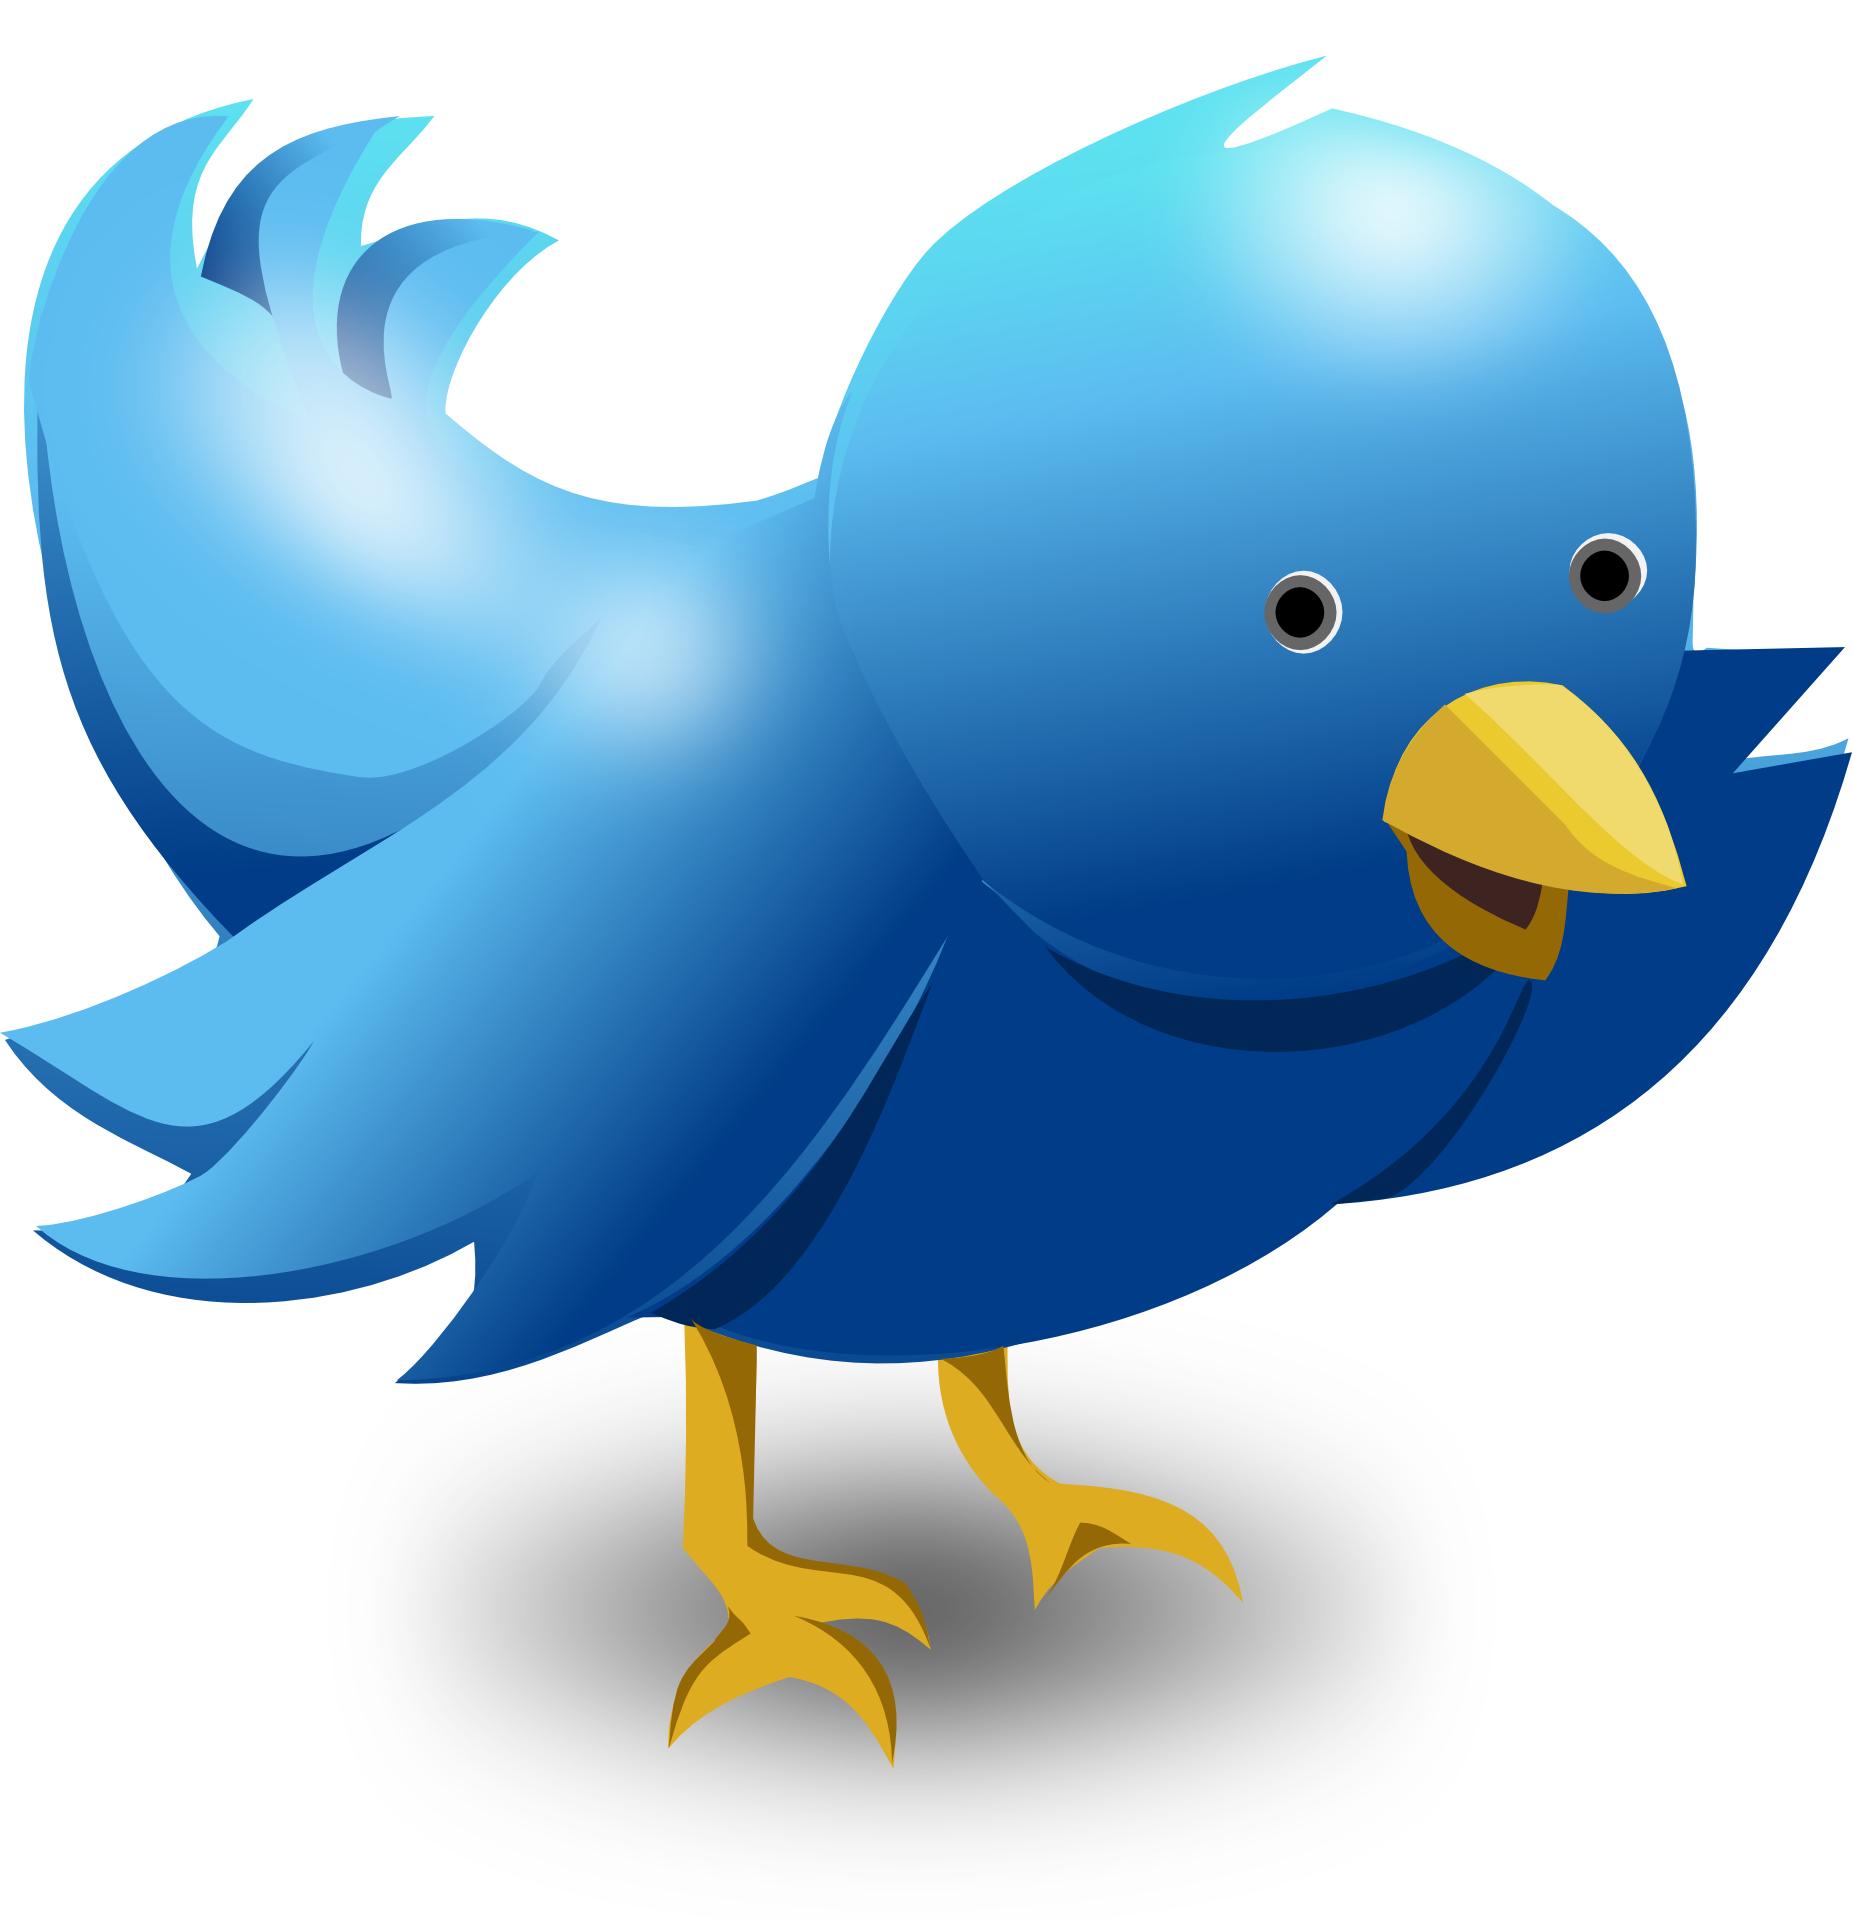 Symbol of twitter vector,cartoon blue bird